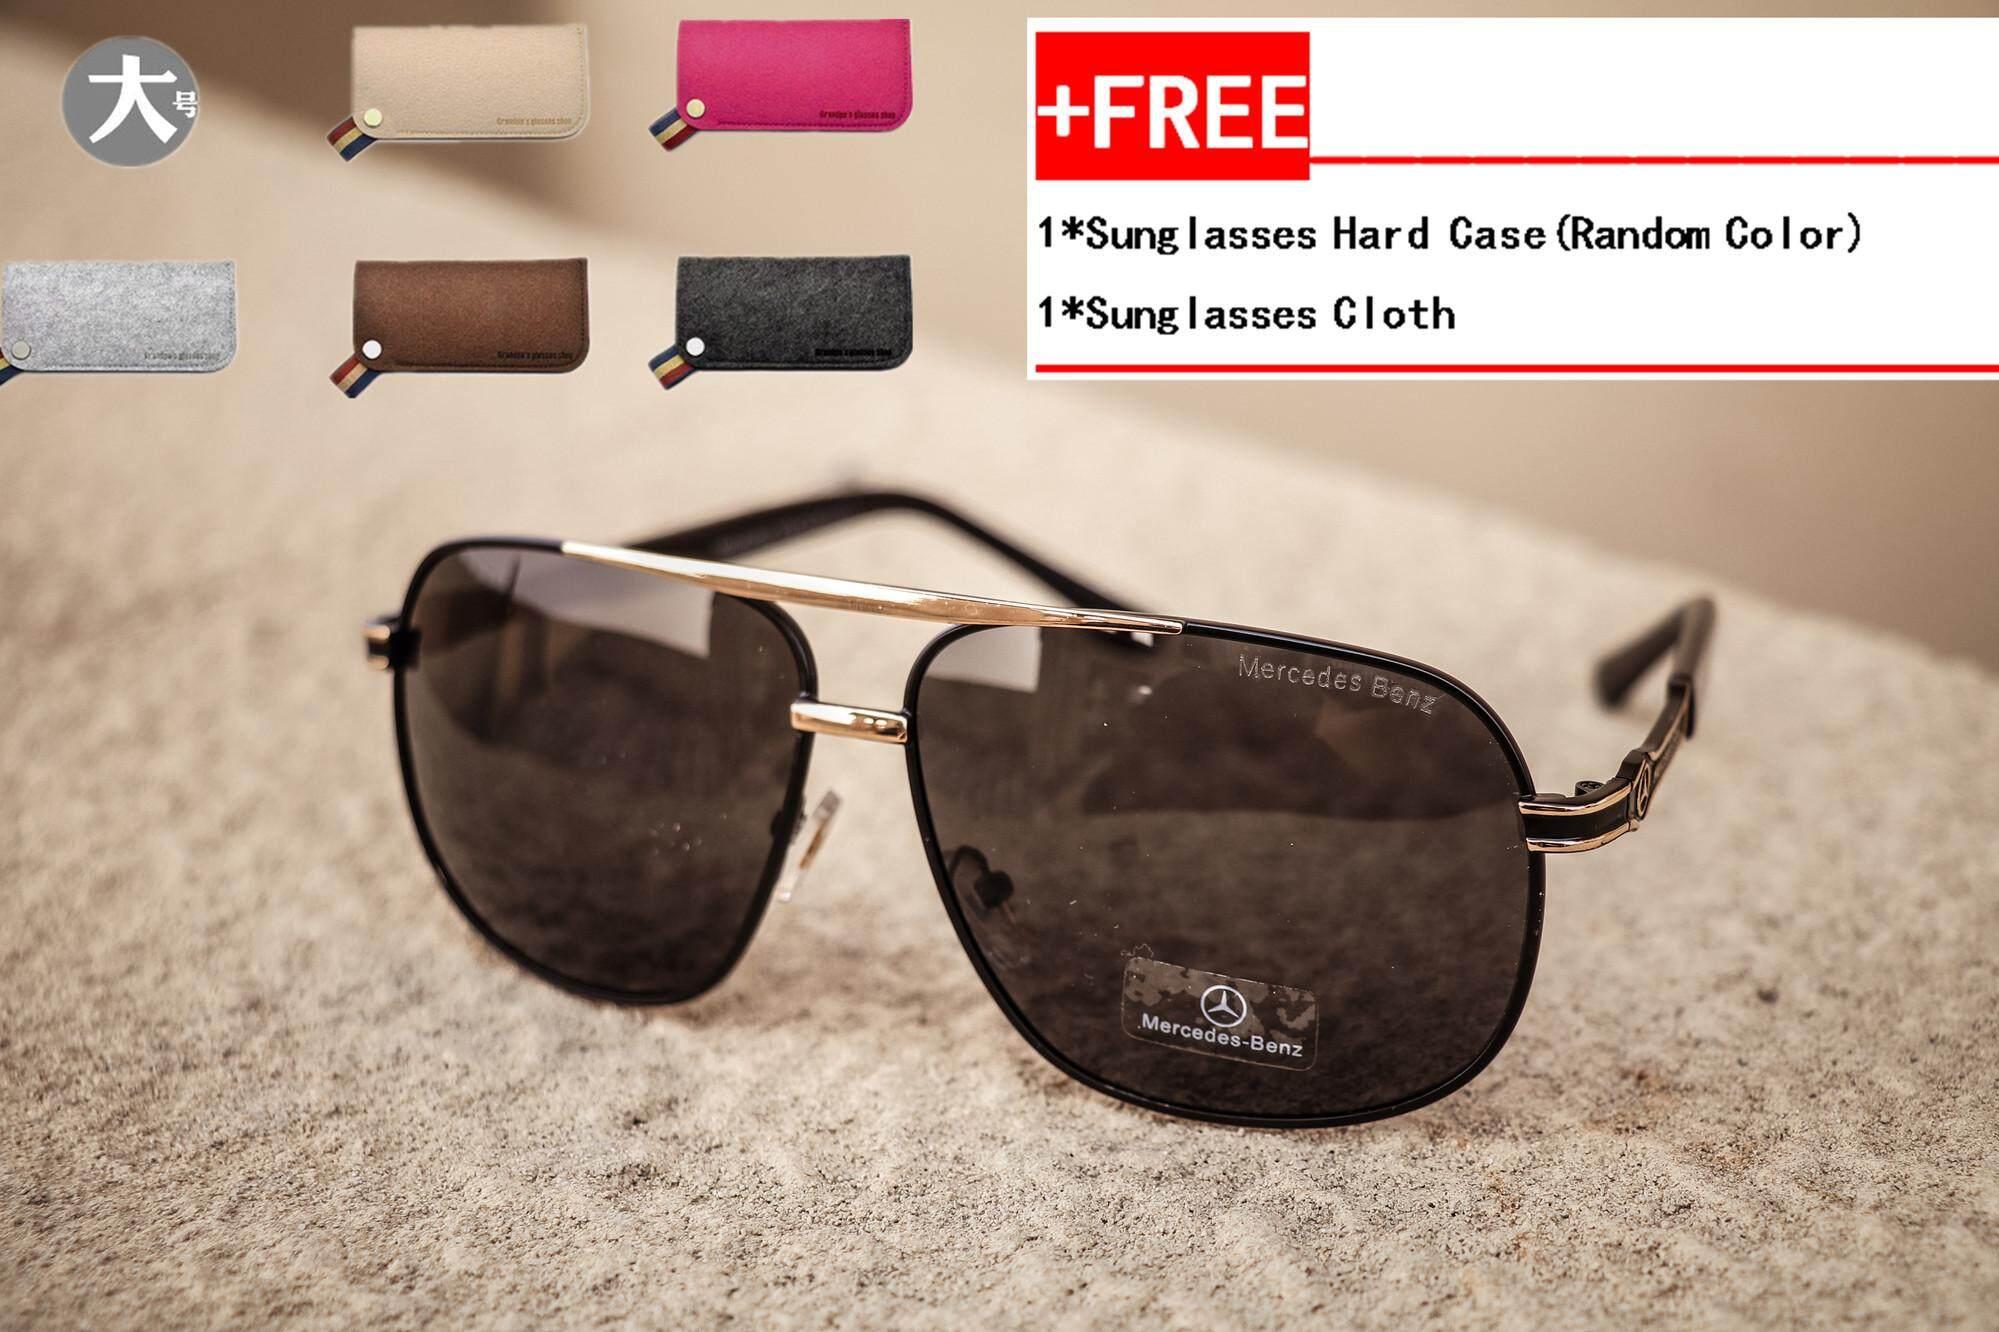 3bea8ff41c1 Men Fashion Sunglasses Men Hipster Polarized UV400 Sunglasses Big Frame  Driving Driver Benz Pooh Mirror